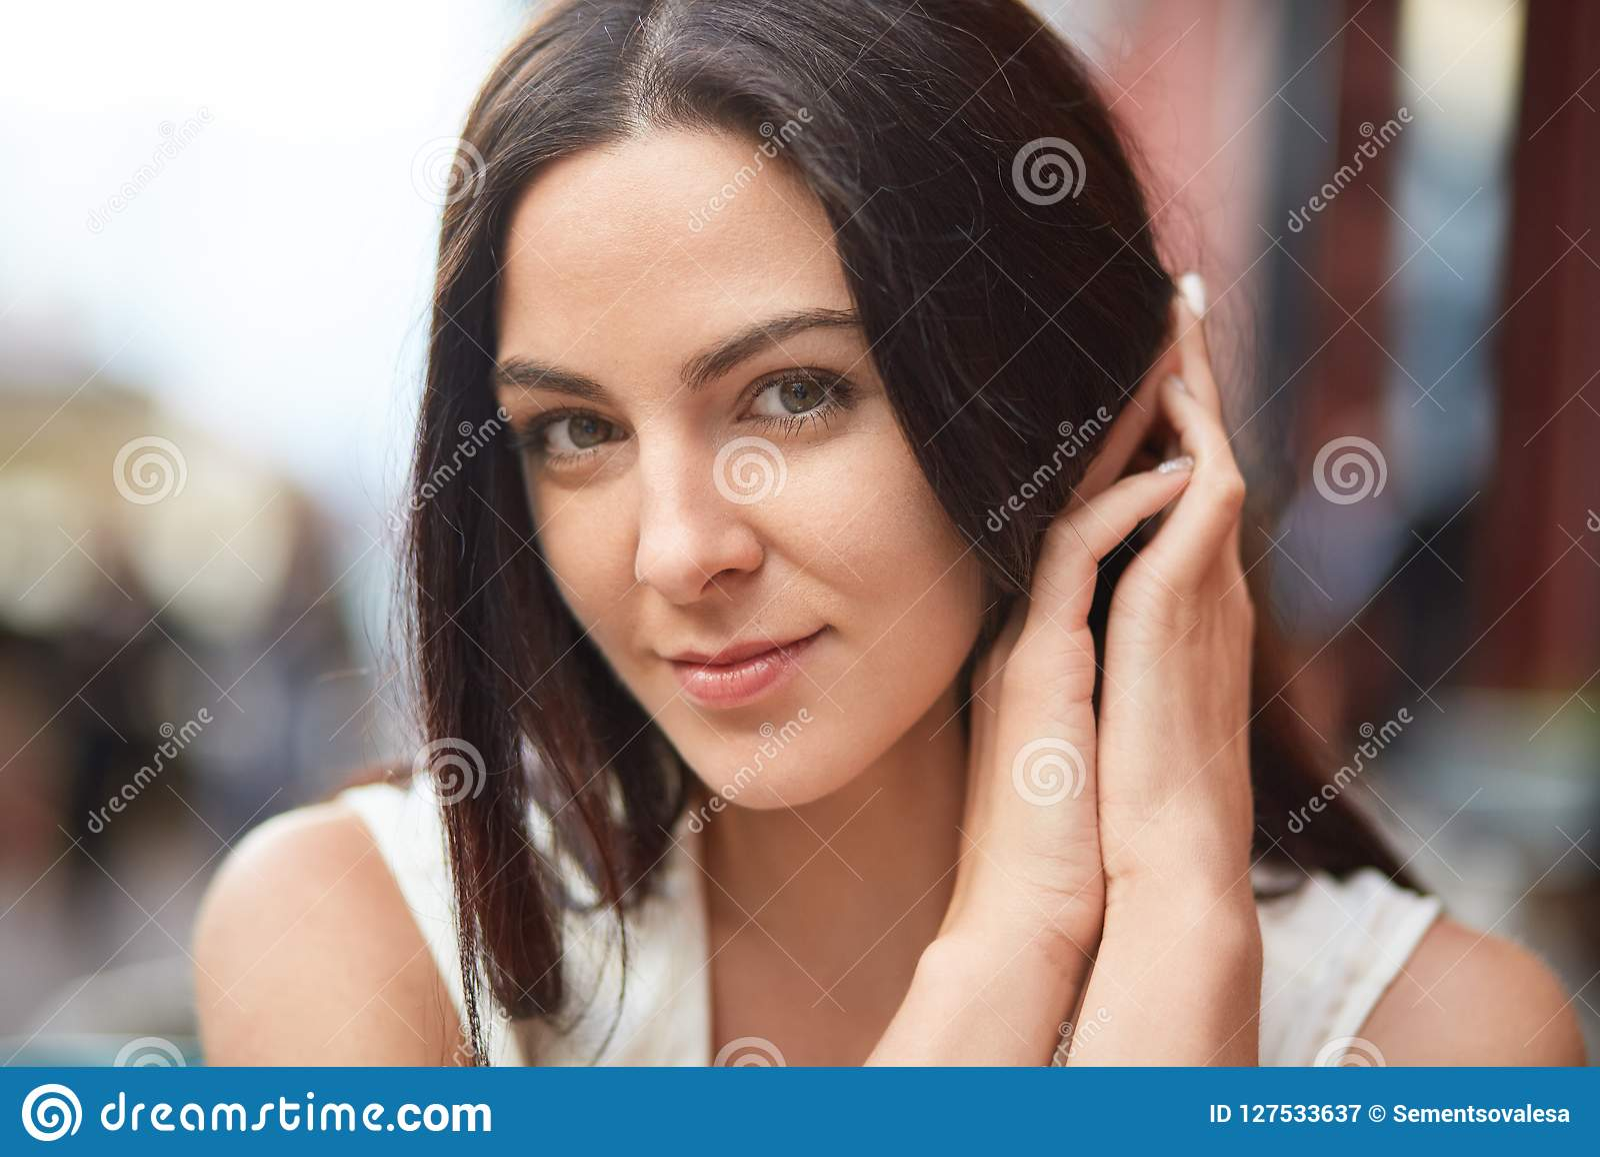 85f2e0da1de Headshot Of Pretty Woman With Dark Hair